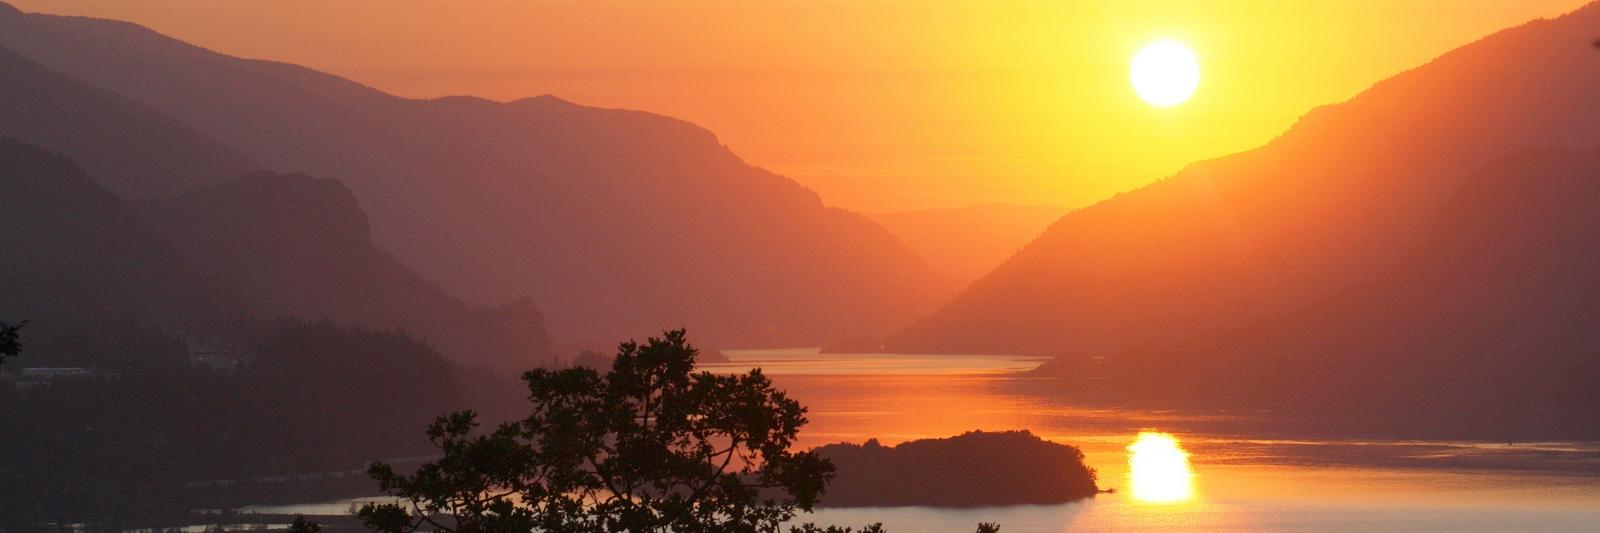 Golden-Gorge-Sunset_1600x533_6965.jpg